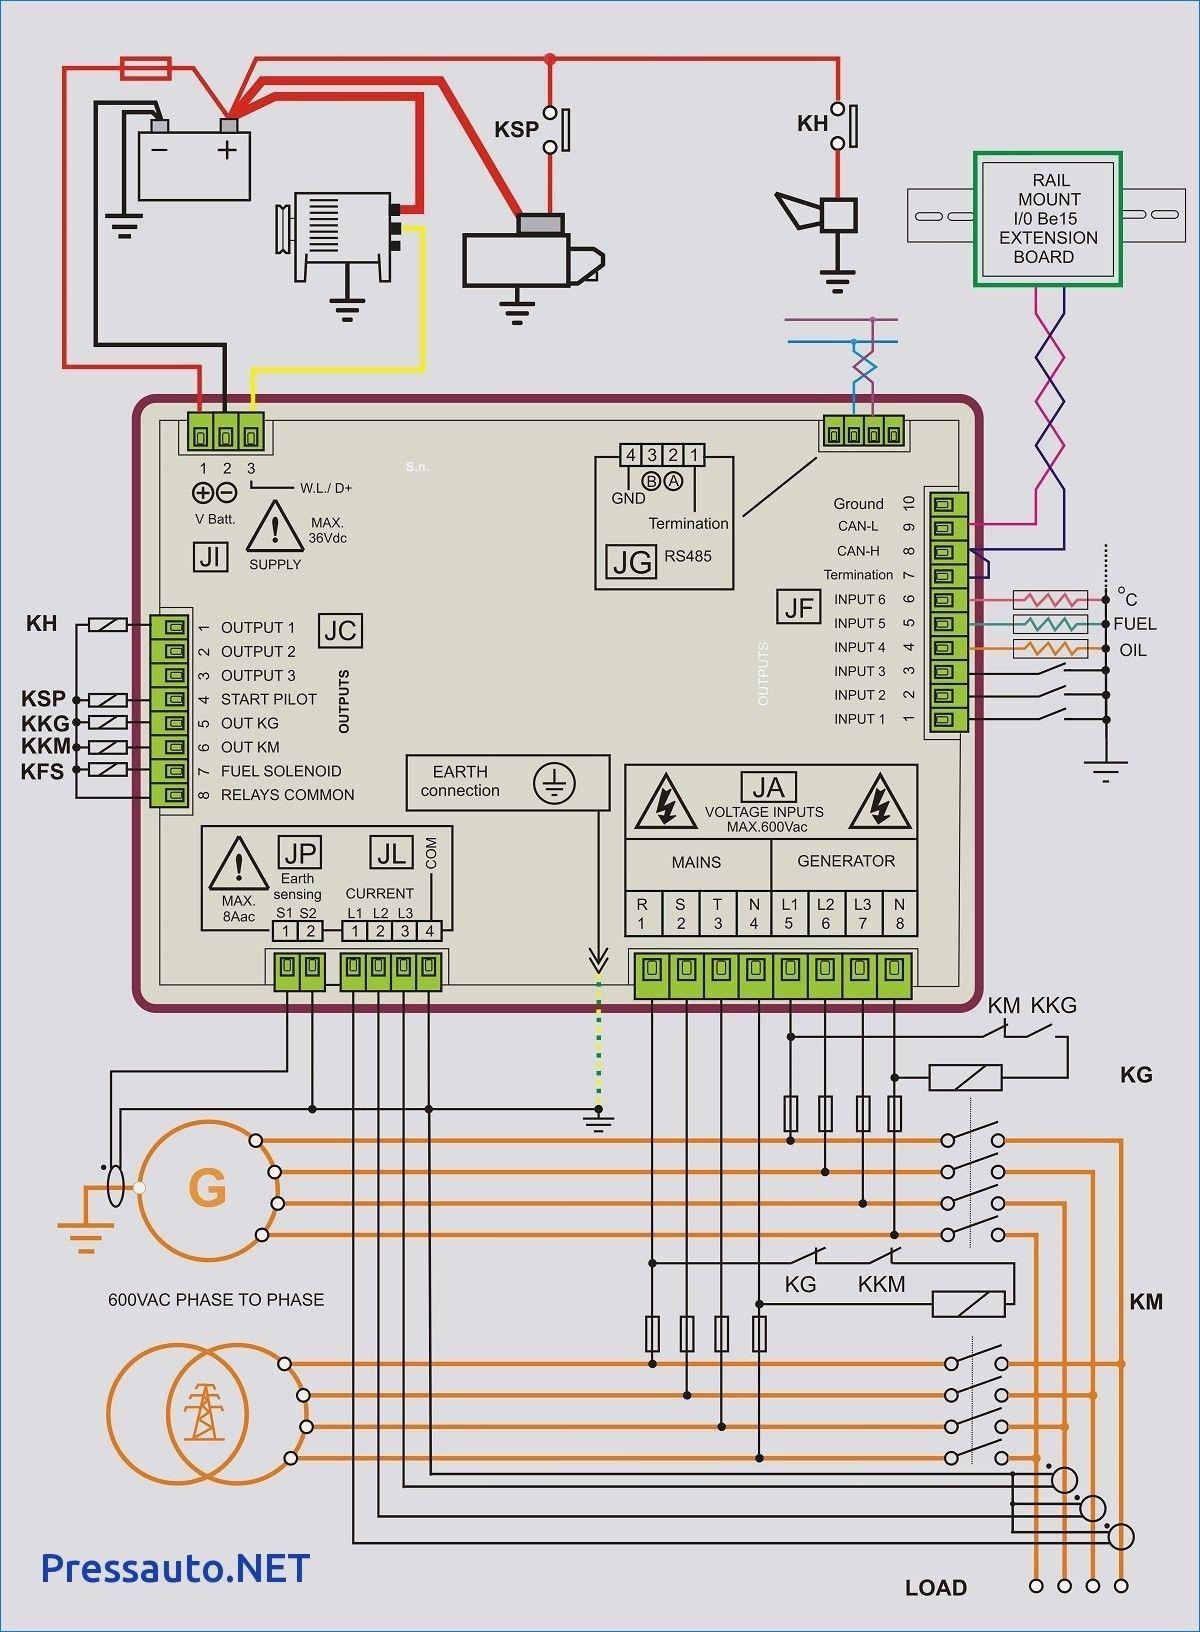 Lincoln 225 Welder Generator Wiring Diagram Generator Transfer Switch Transfer Switch Electrical Circuit Diagram